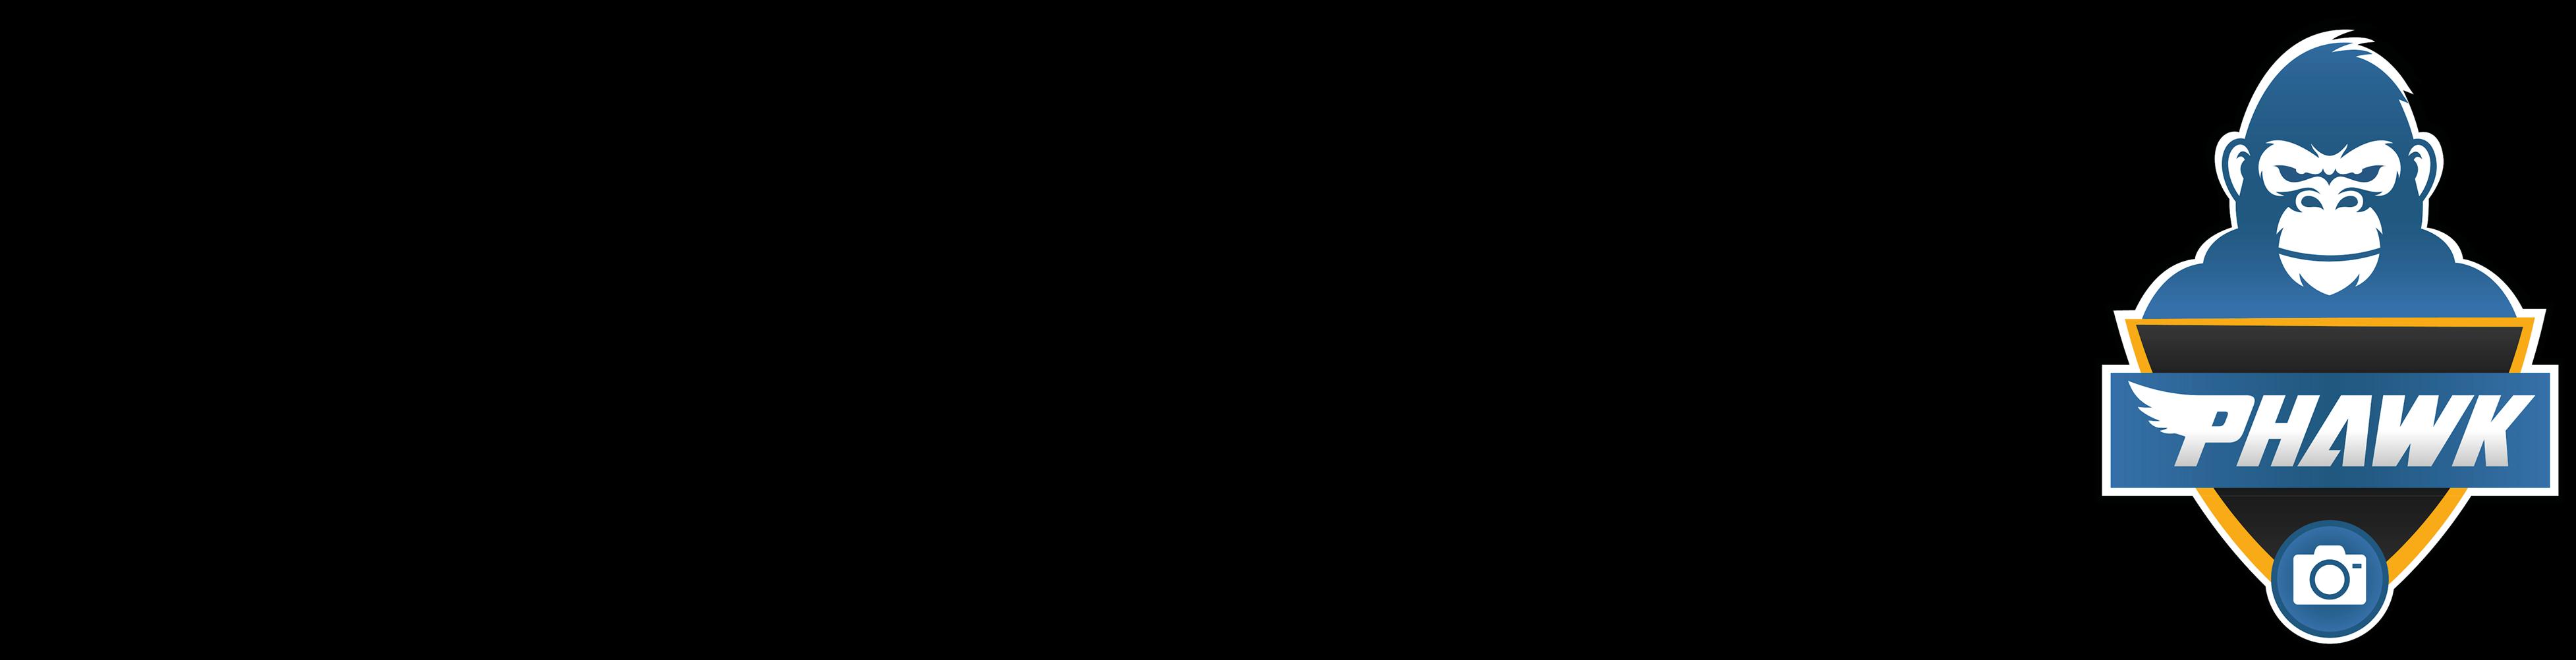 Phawkmania Logo